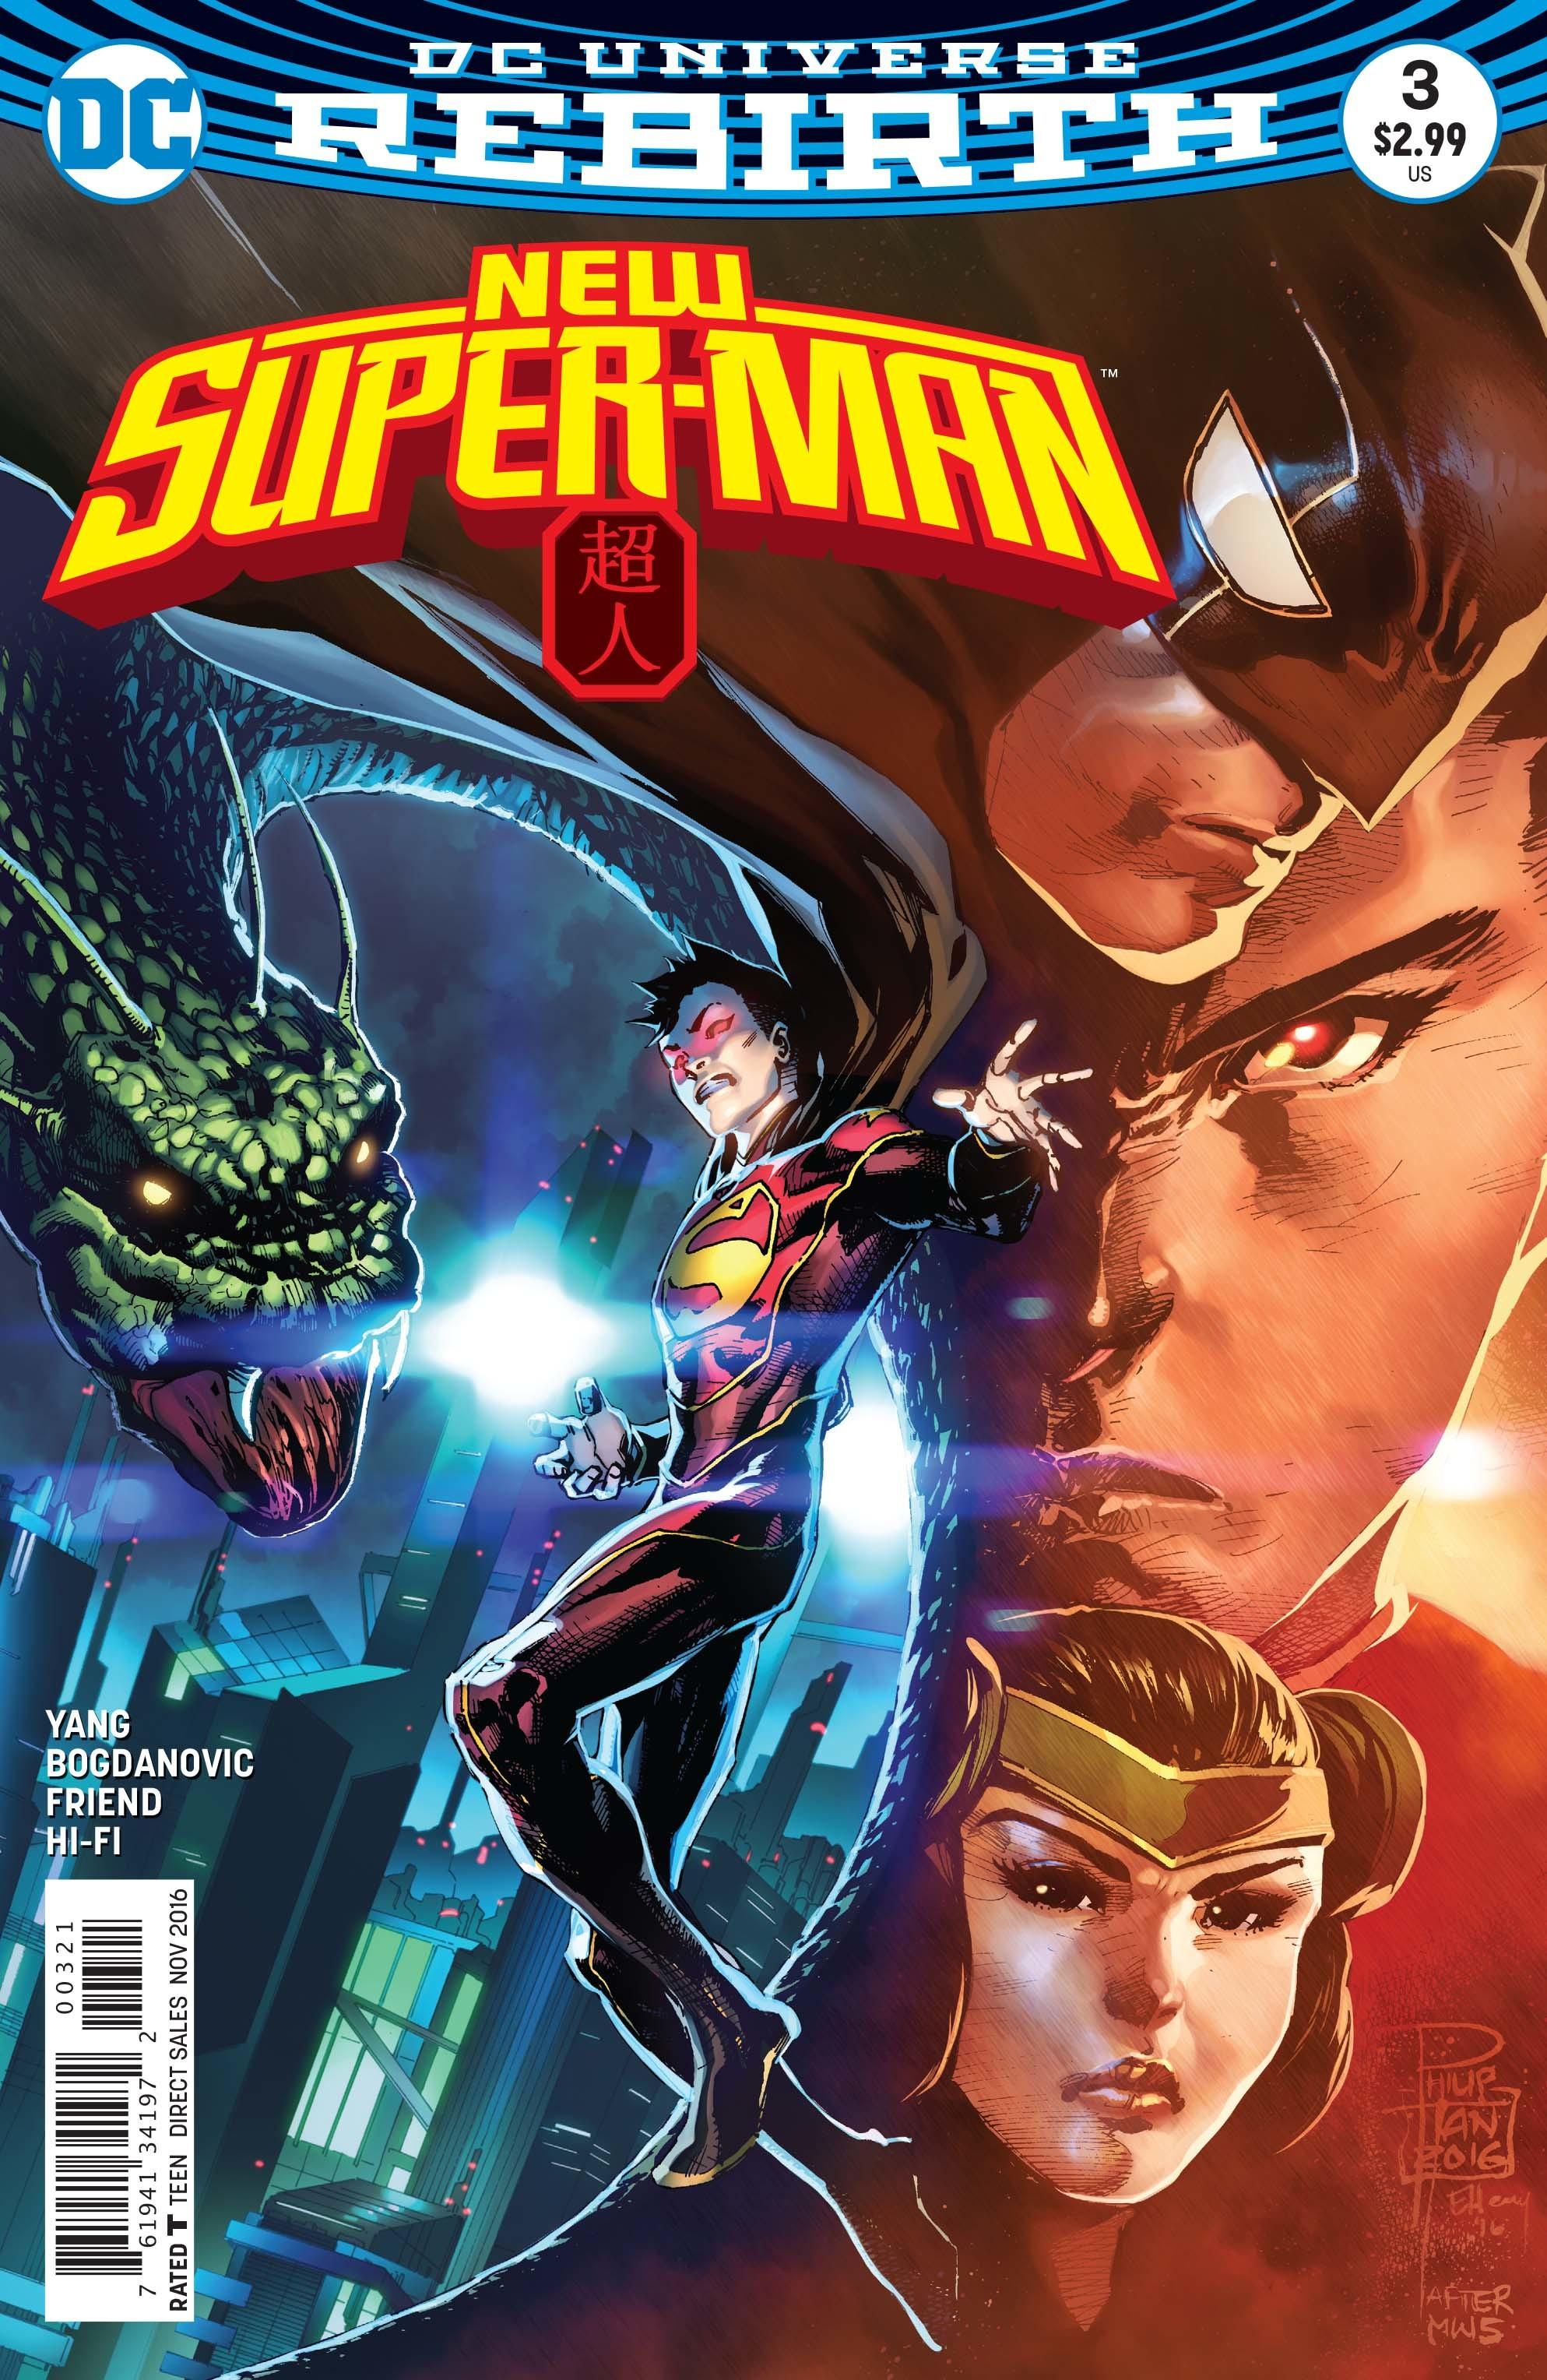 DC Comics 'New Super-Man' Chinese Superman